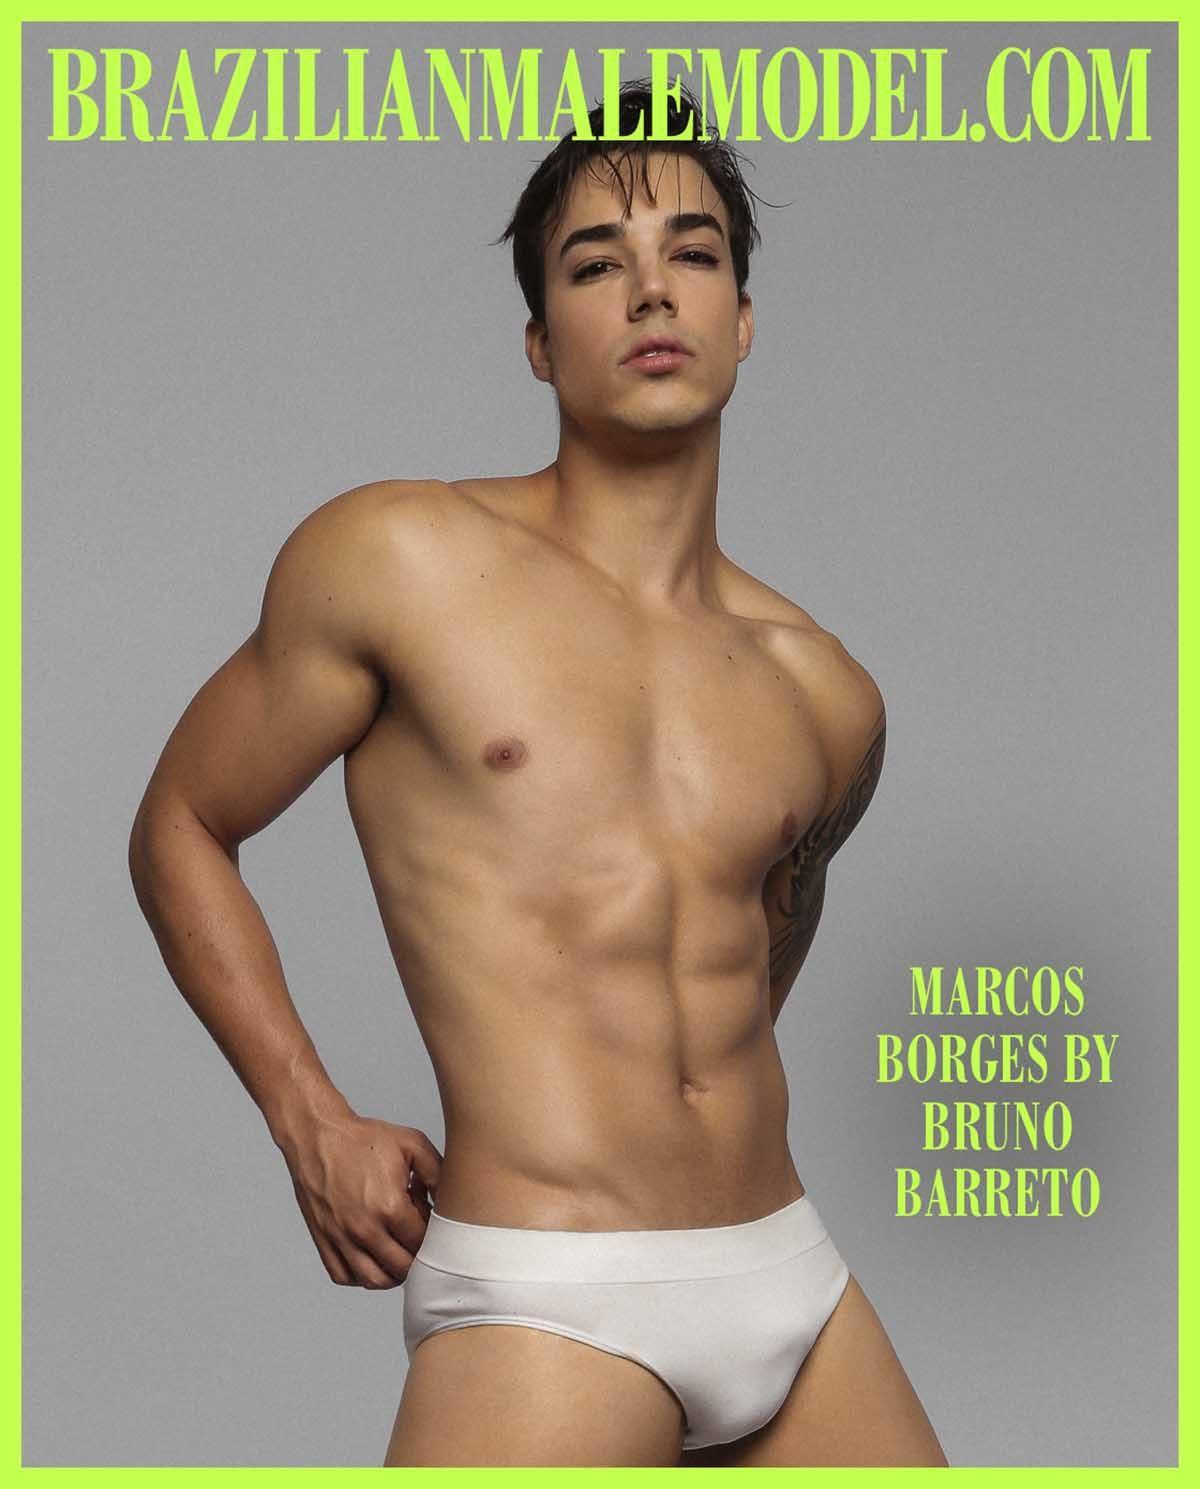 Marcos Borges by Bruno Barreto